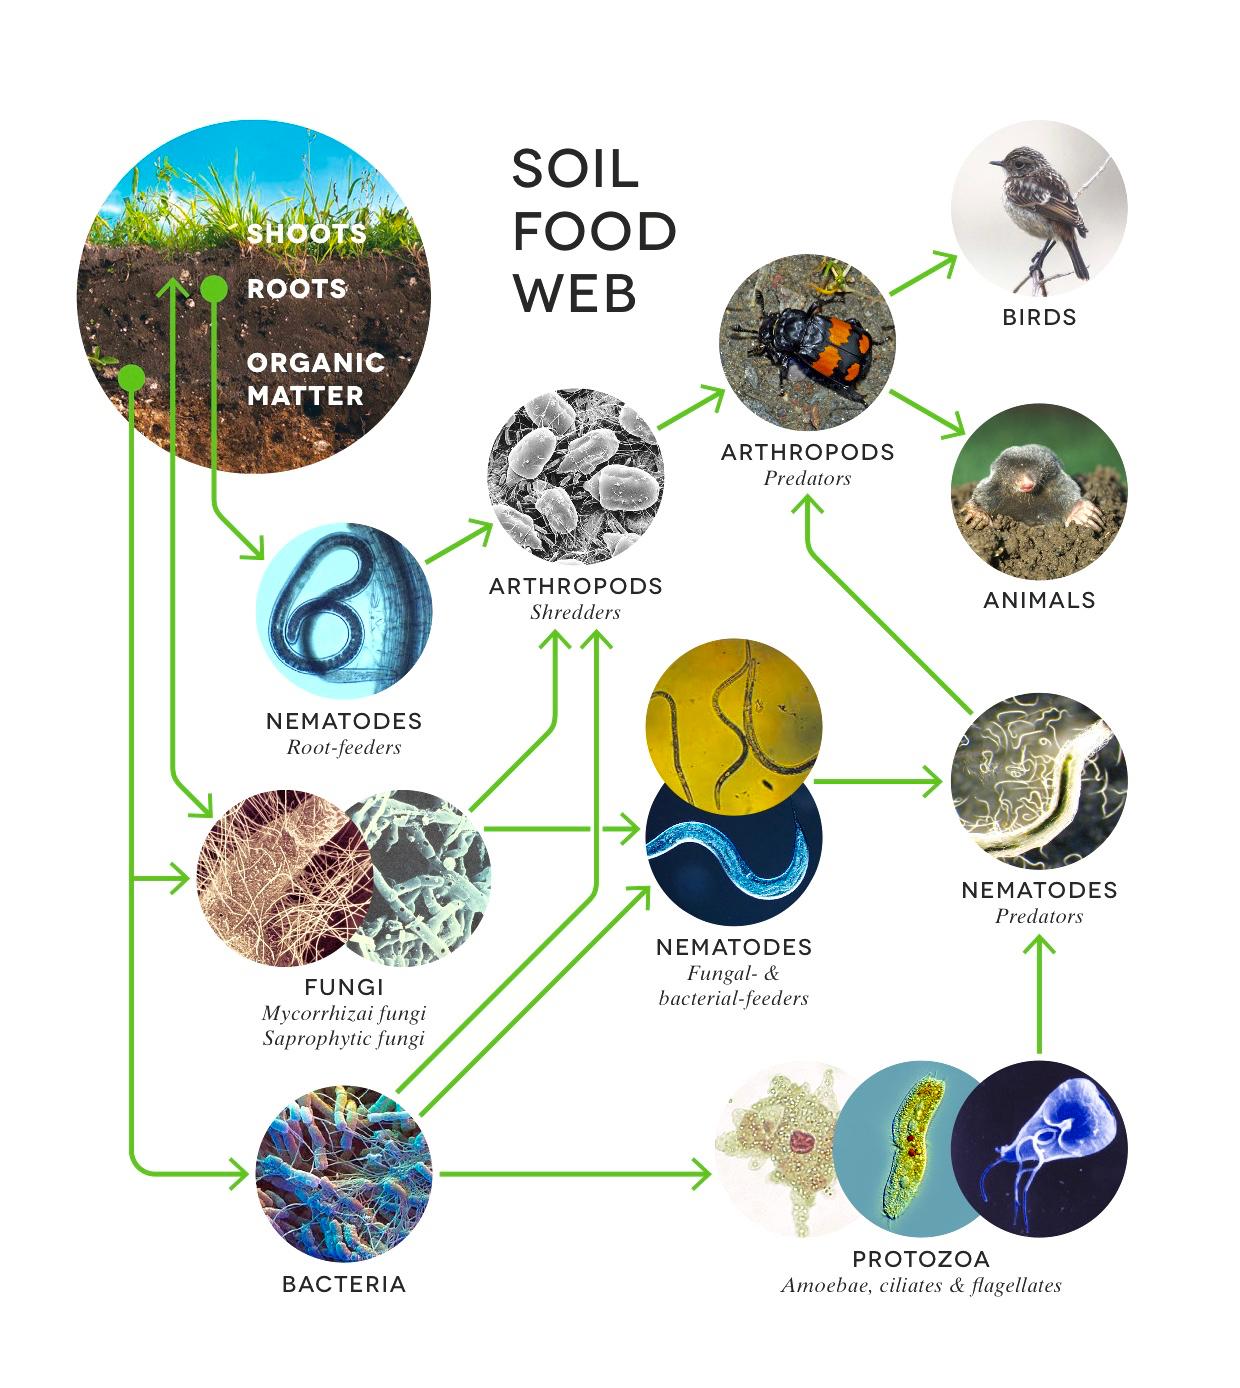 SoilFoodWeb_Large_2.0ß.jpg